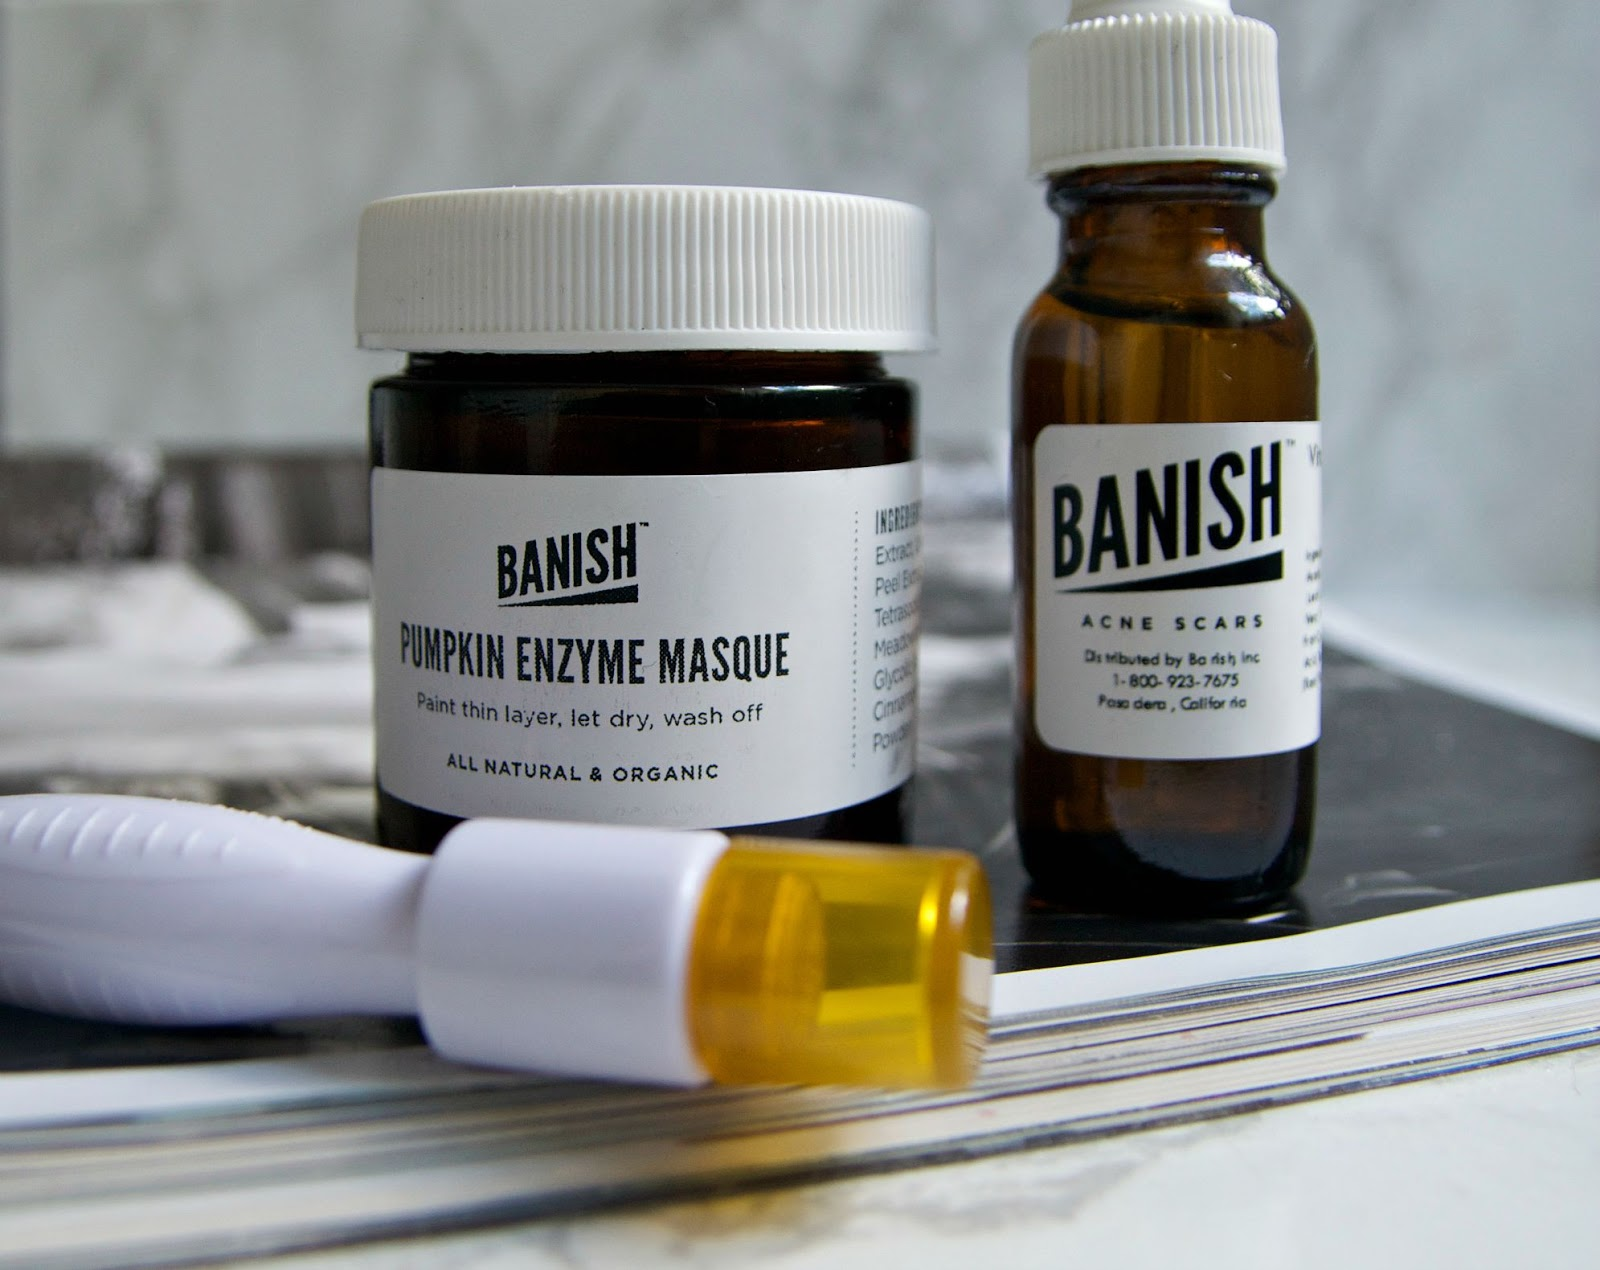 banish review instagram